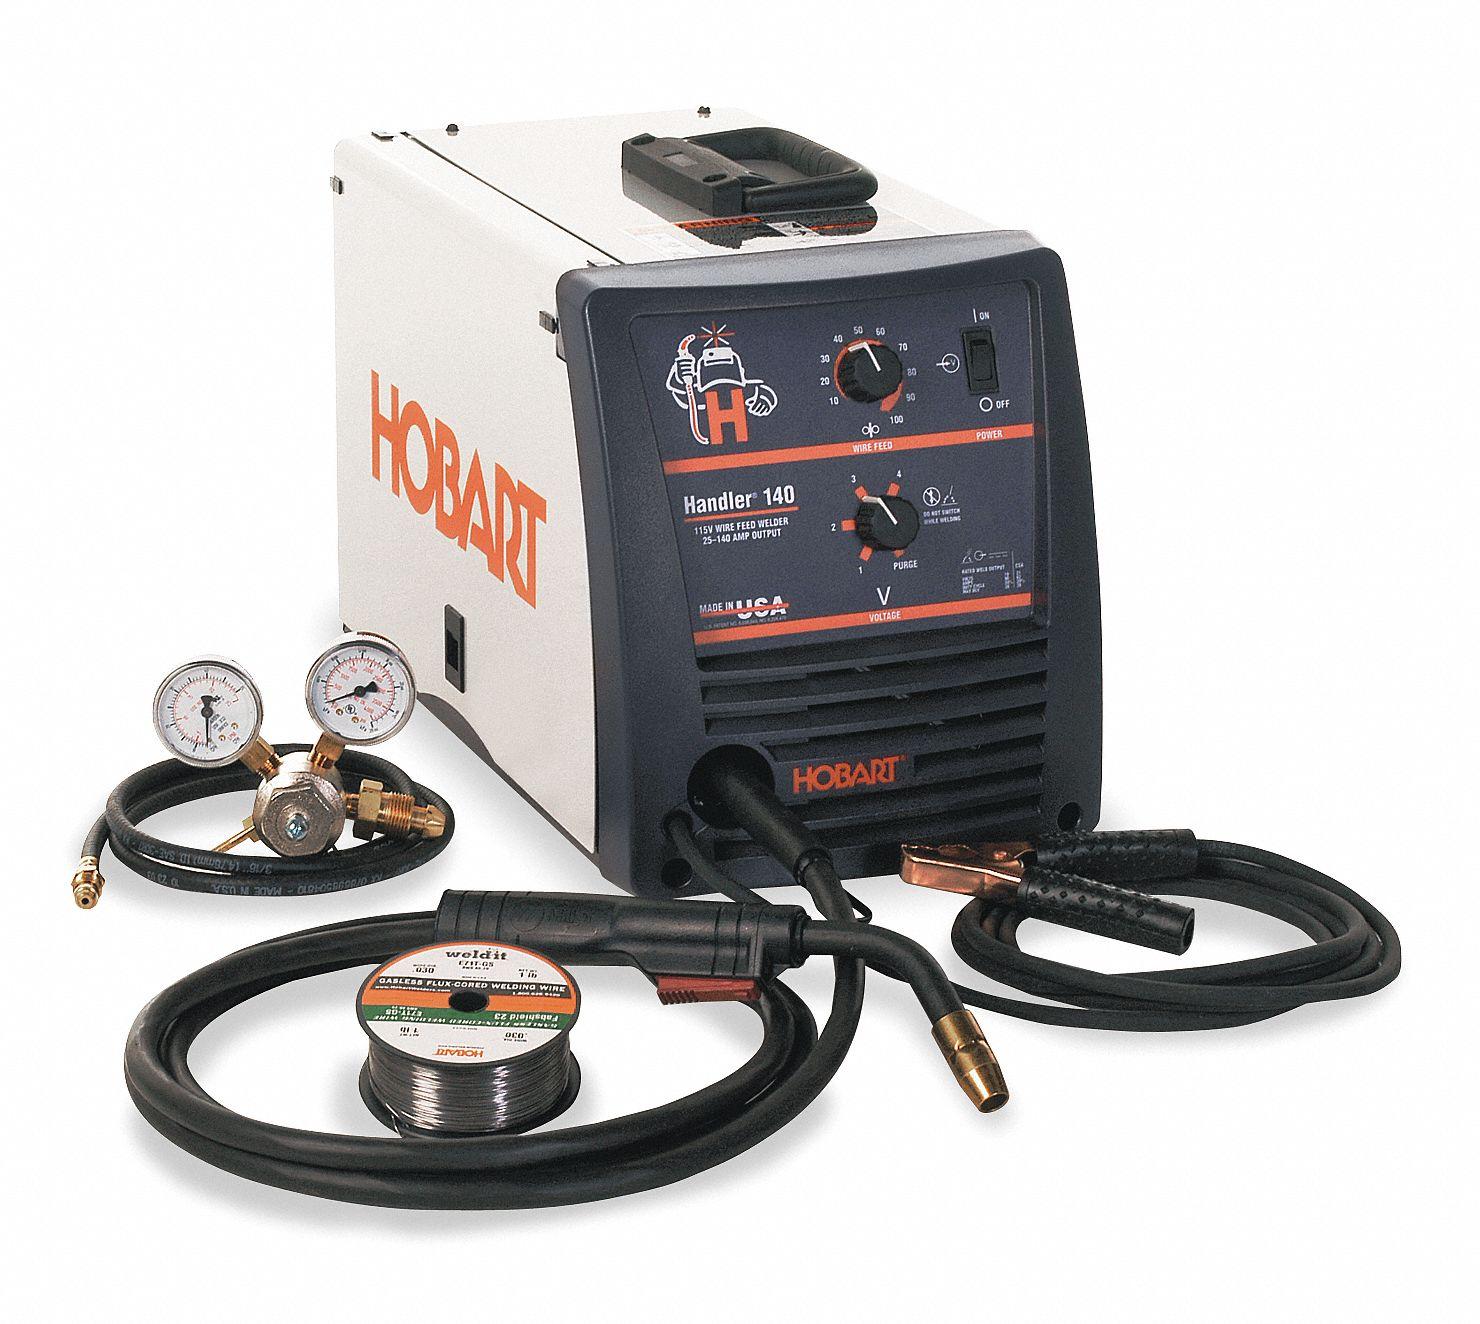 HOBART MIG Welder, Handler 140 Series, Input Voltage: 120VAC, Flux ...